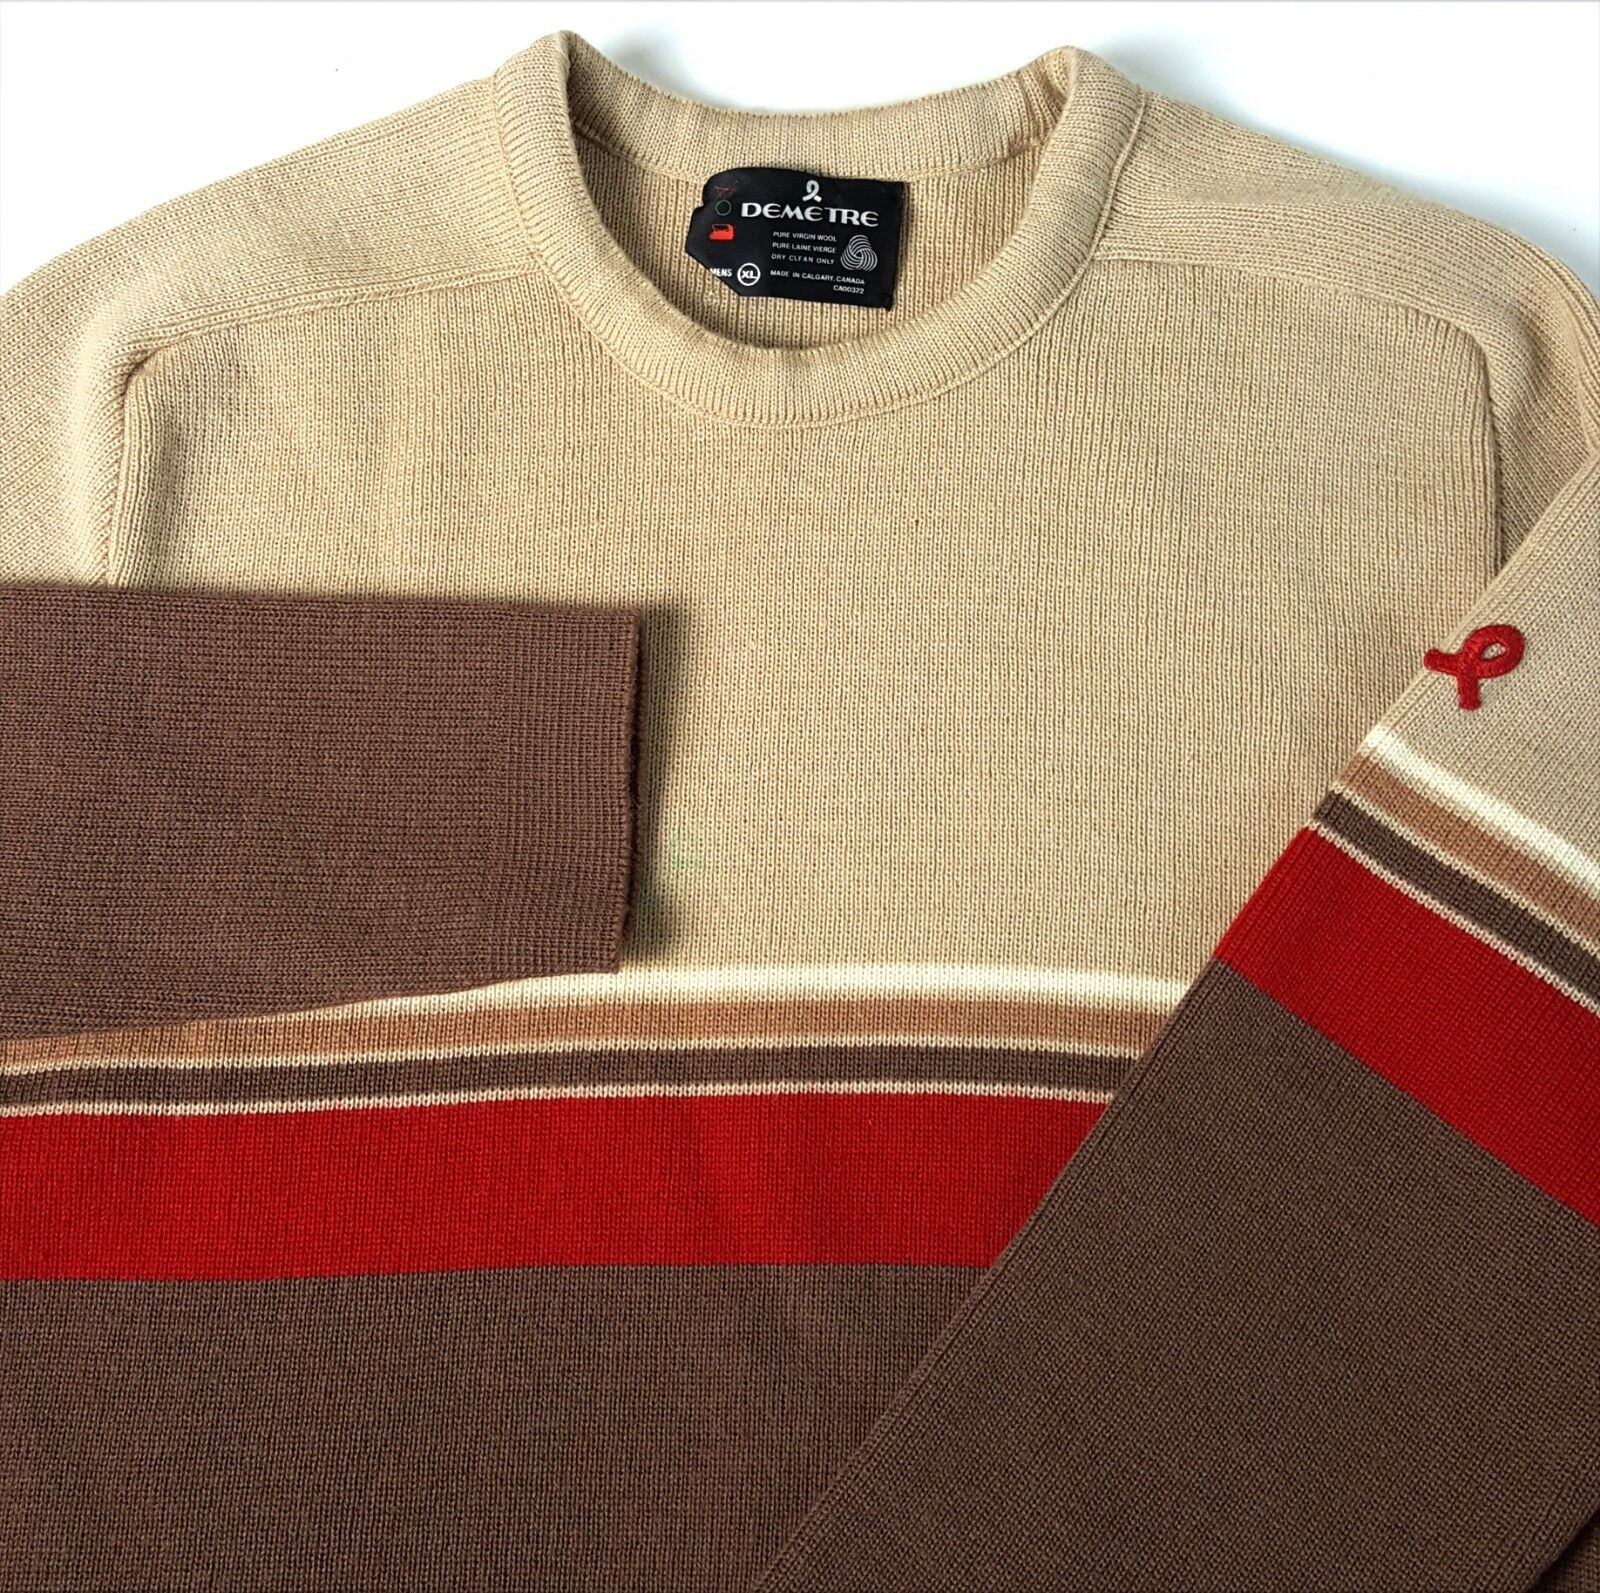 VTG Demetre Med Pure Wool Ski Sweater Beige Burgundy MADE CANADA